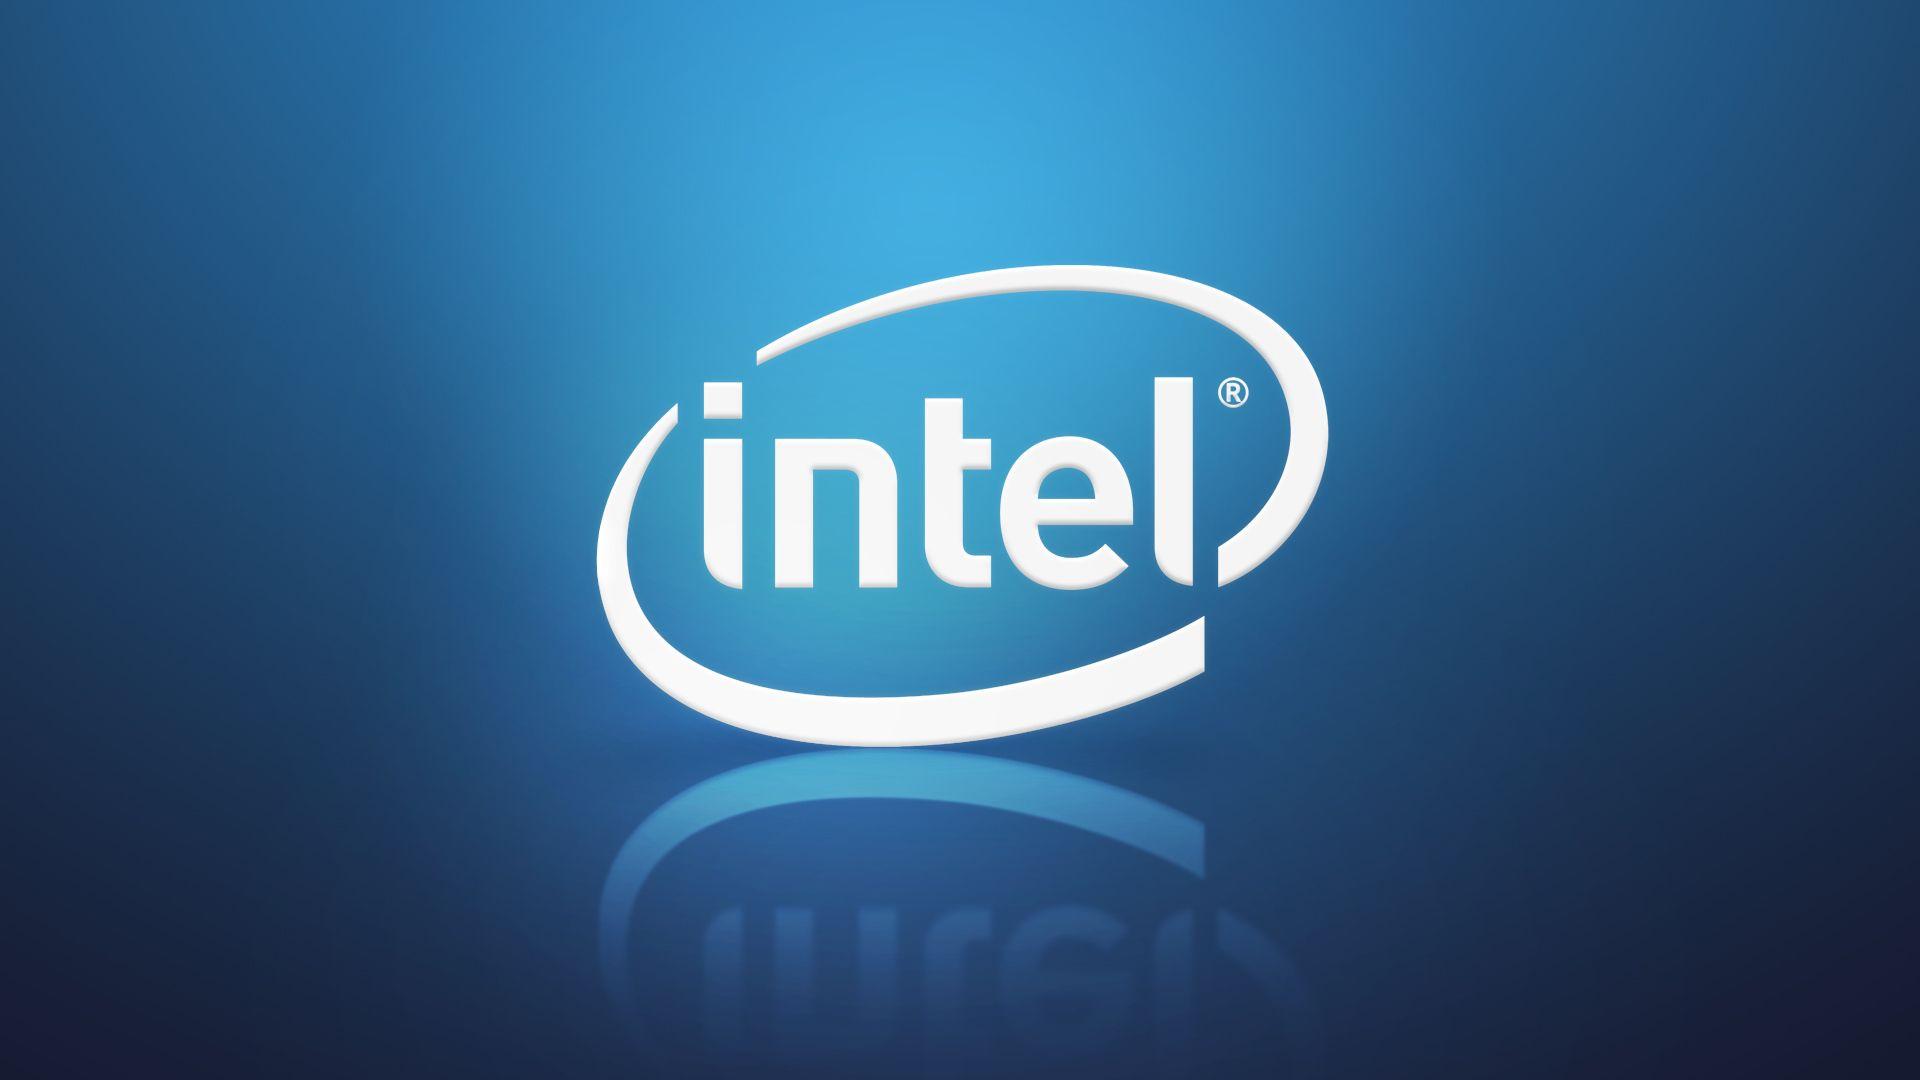 Intel Wallpapers - Wallpaper Cave